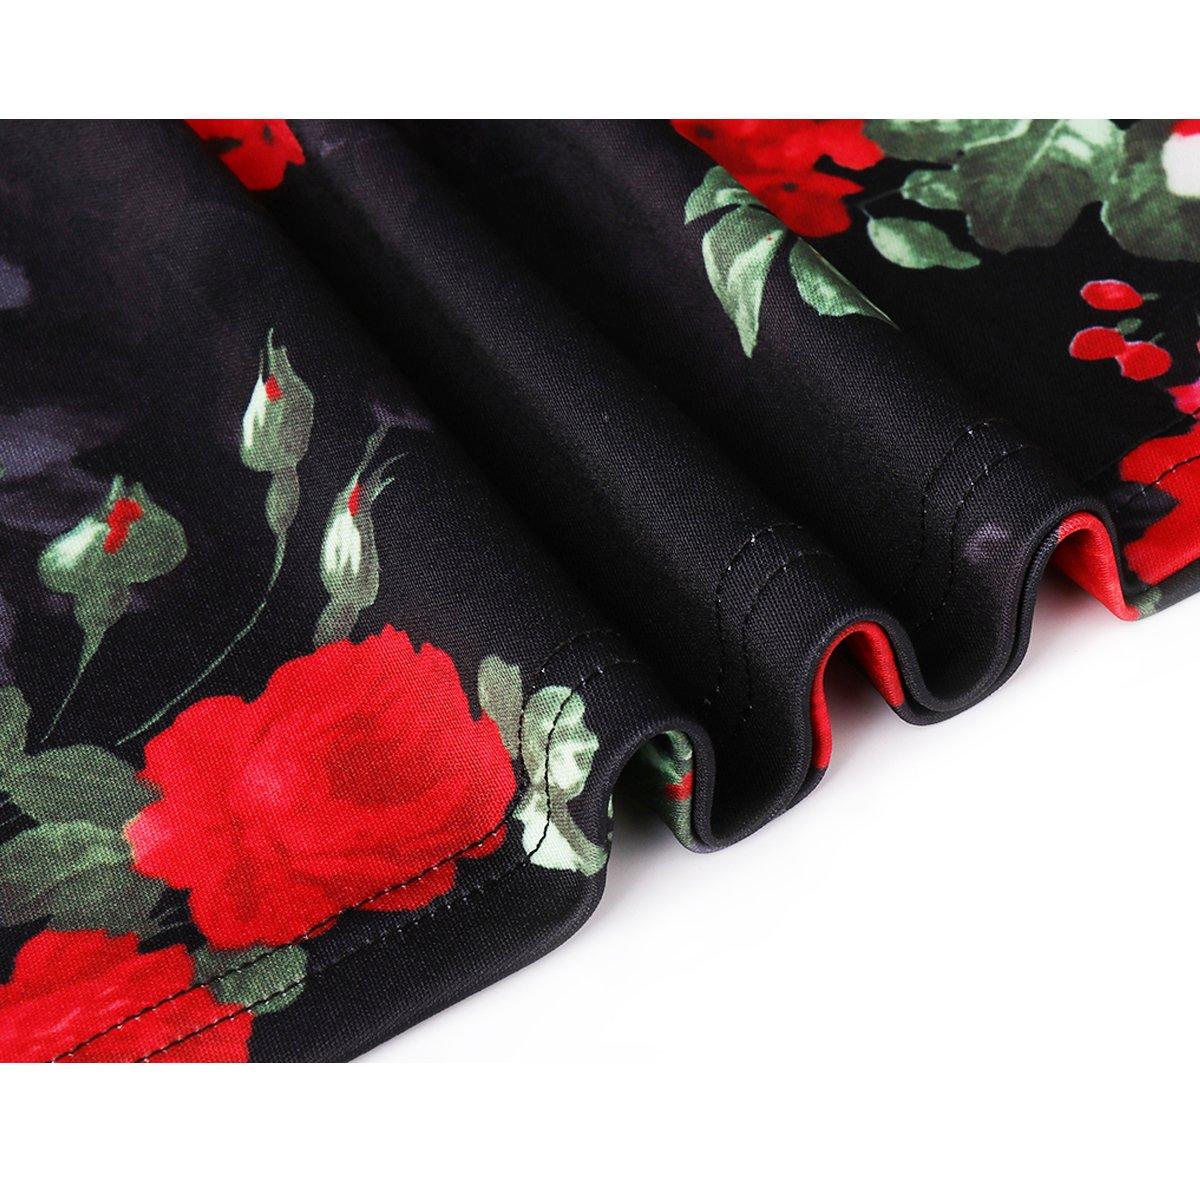 Zumine Women\'s Vintage Floral Midi Dress V-Neck half Sleeve Party cocktail dress (S, Red Floral)